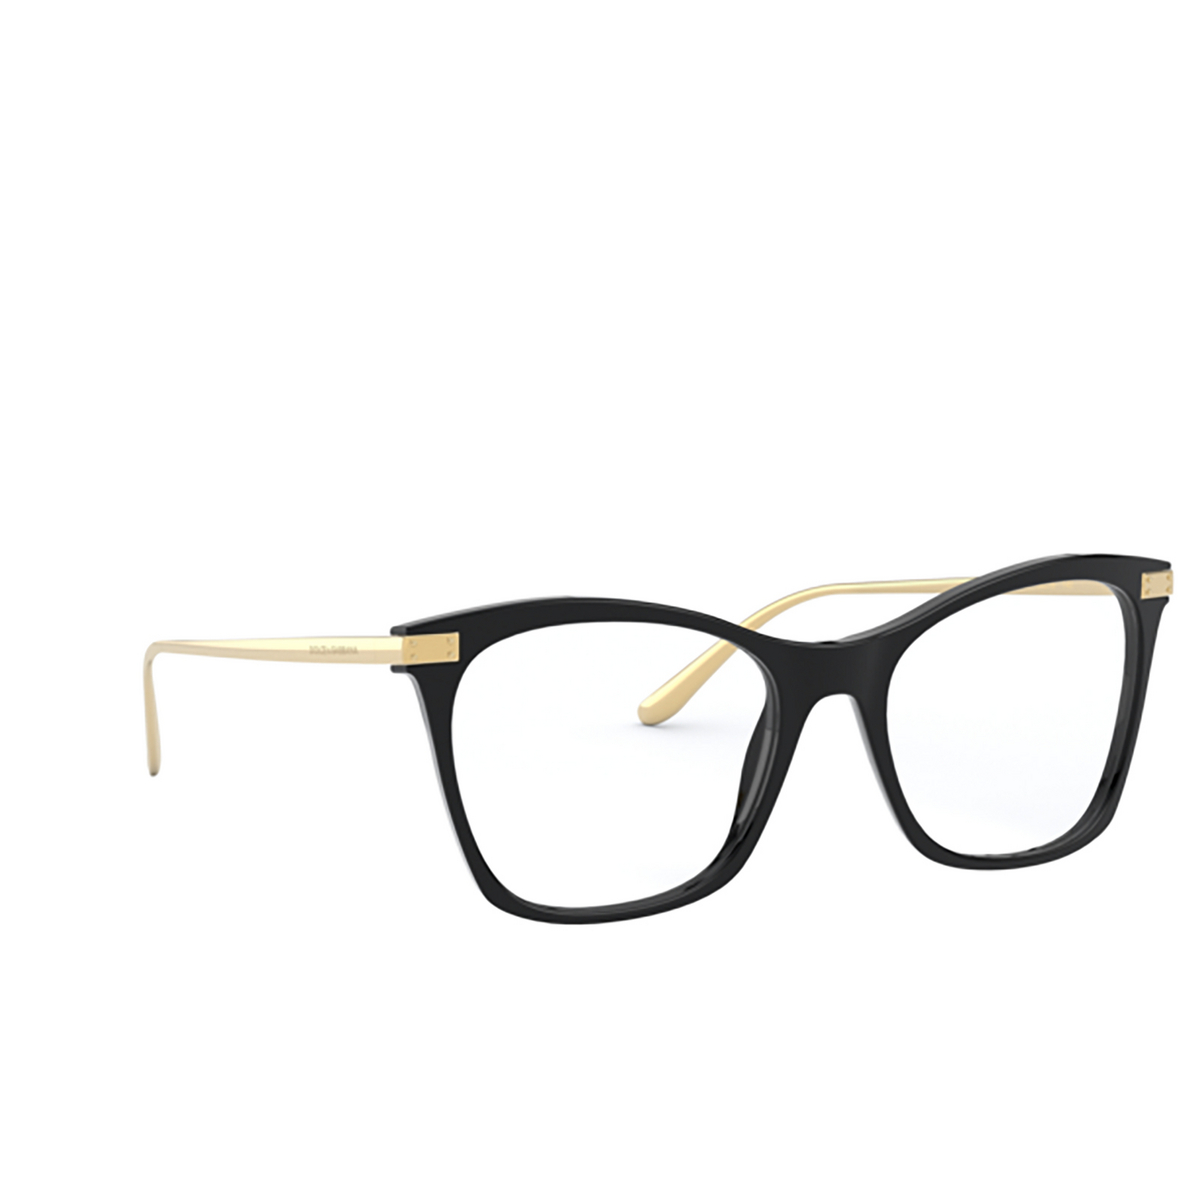 Dolce & Gabbana® Square Eyeglasses: DG3331 color Black 501 - three-quarters view.